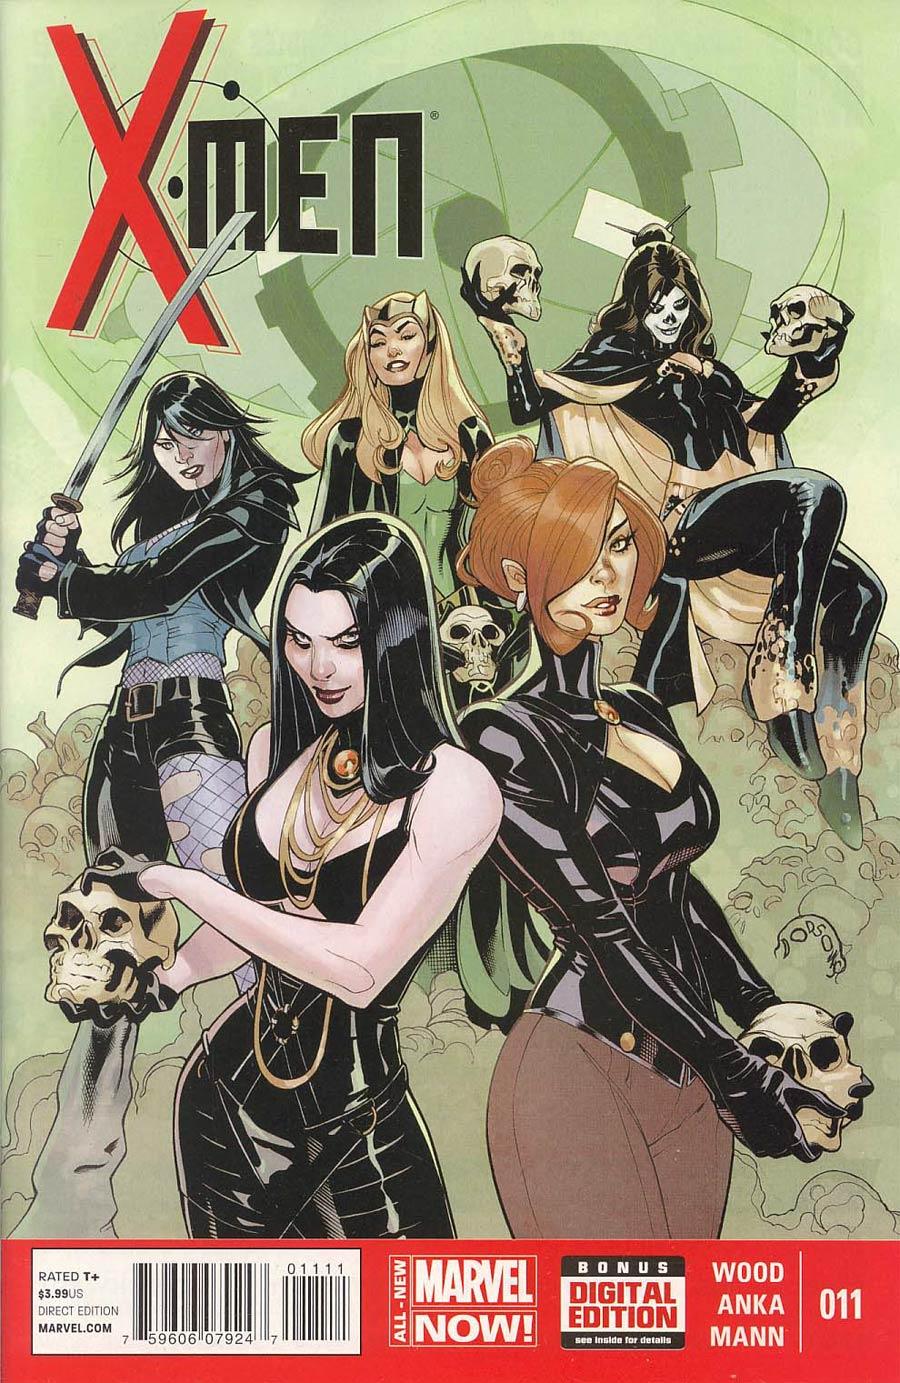 X-Men Vol 4 #11 Cover A Regular Terry Dodson Cover